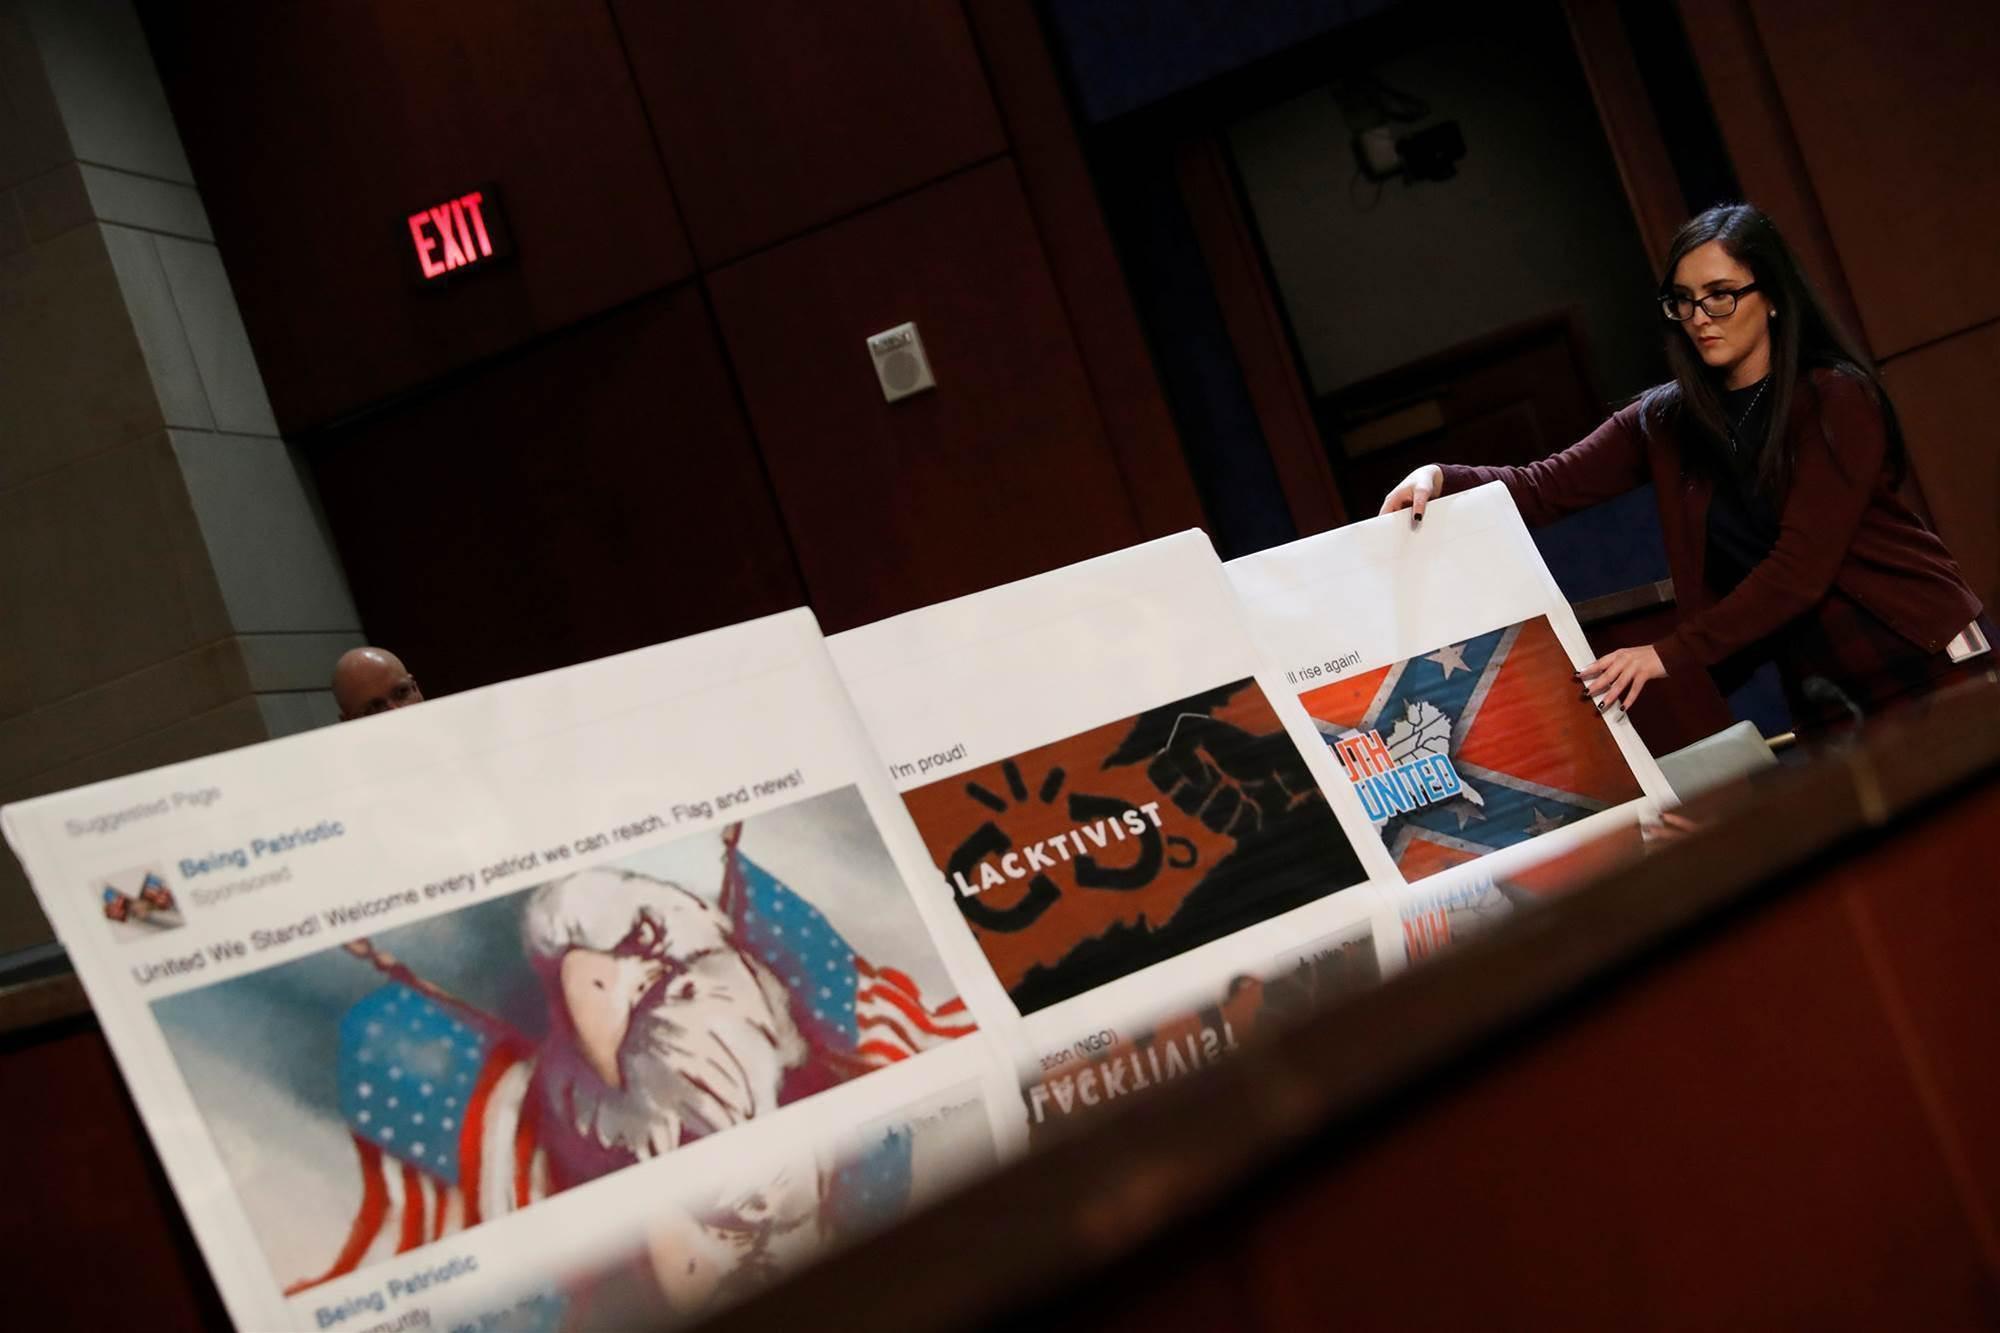 Russia social media meddling more widespread - reports